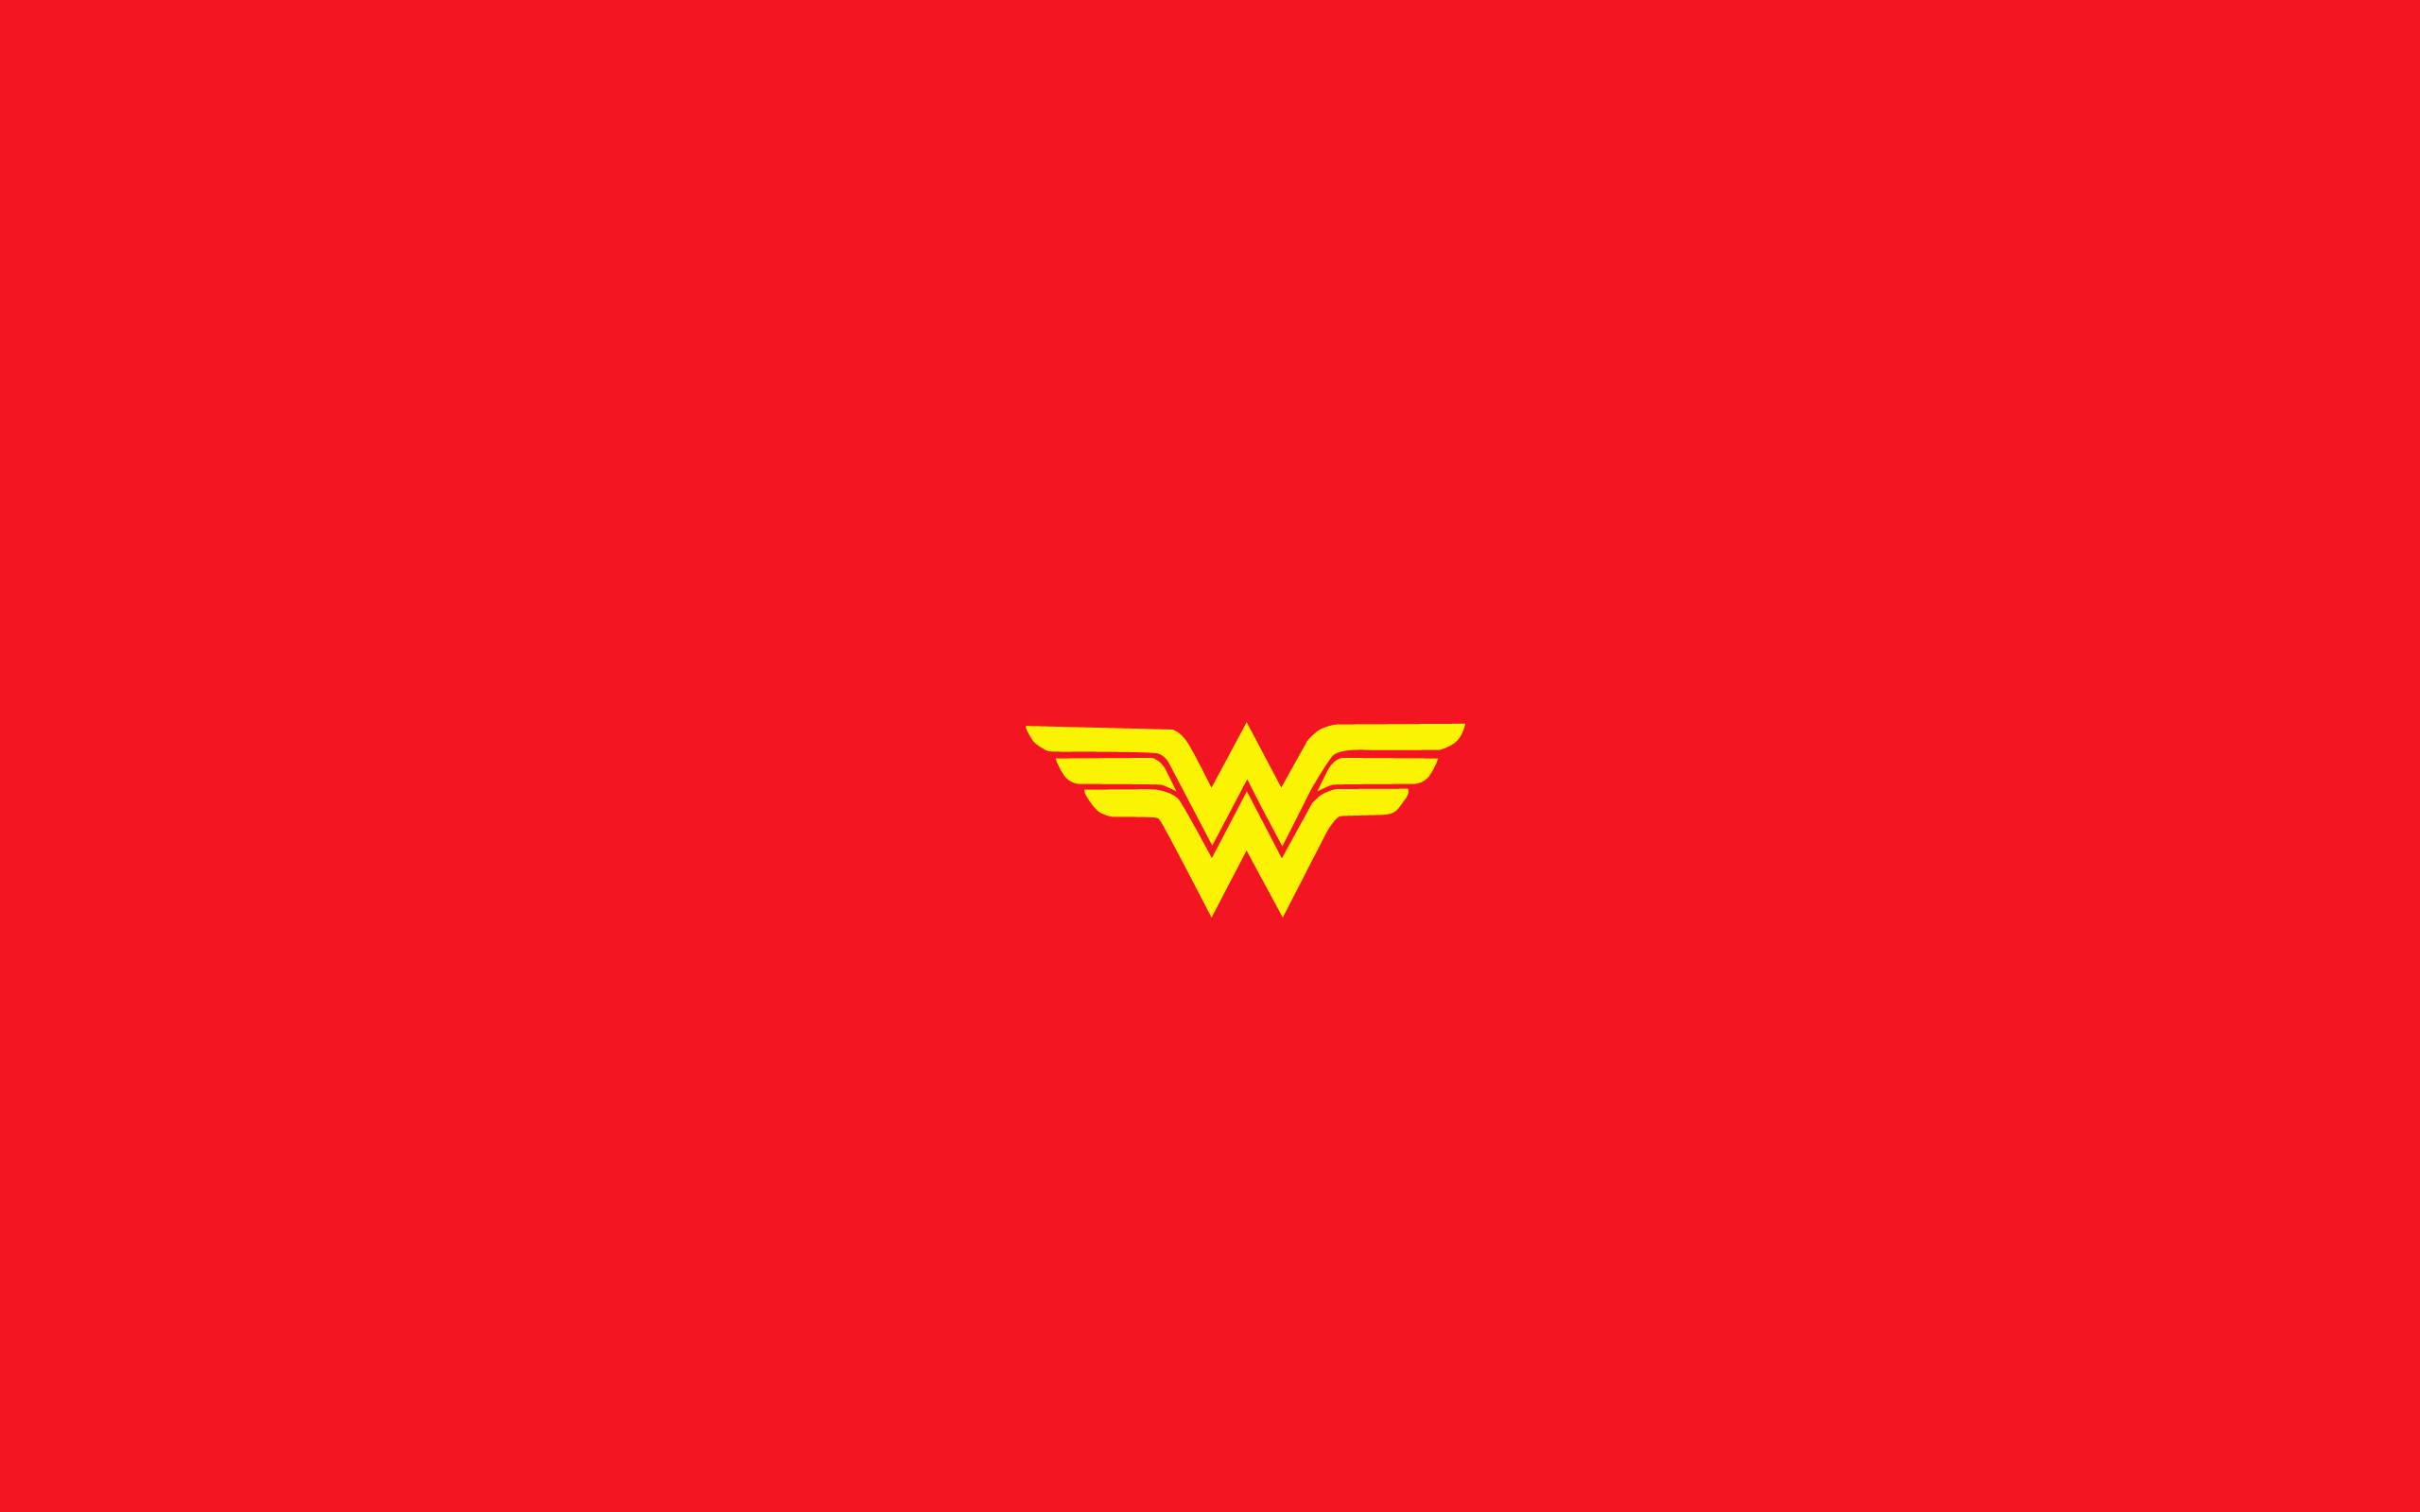 Wonder woman logo wallpaper wonder woman biocorpaavc Images